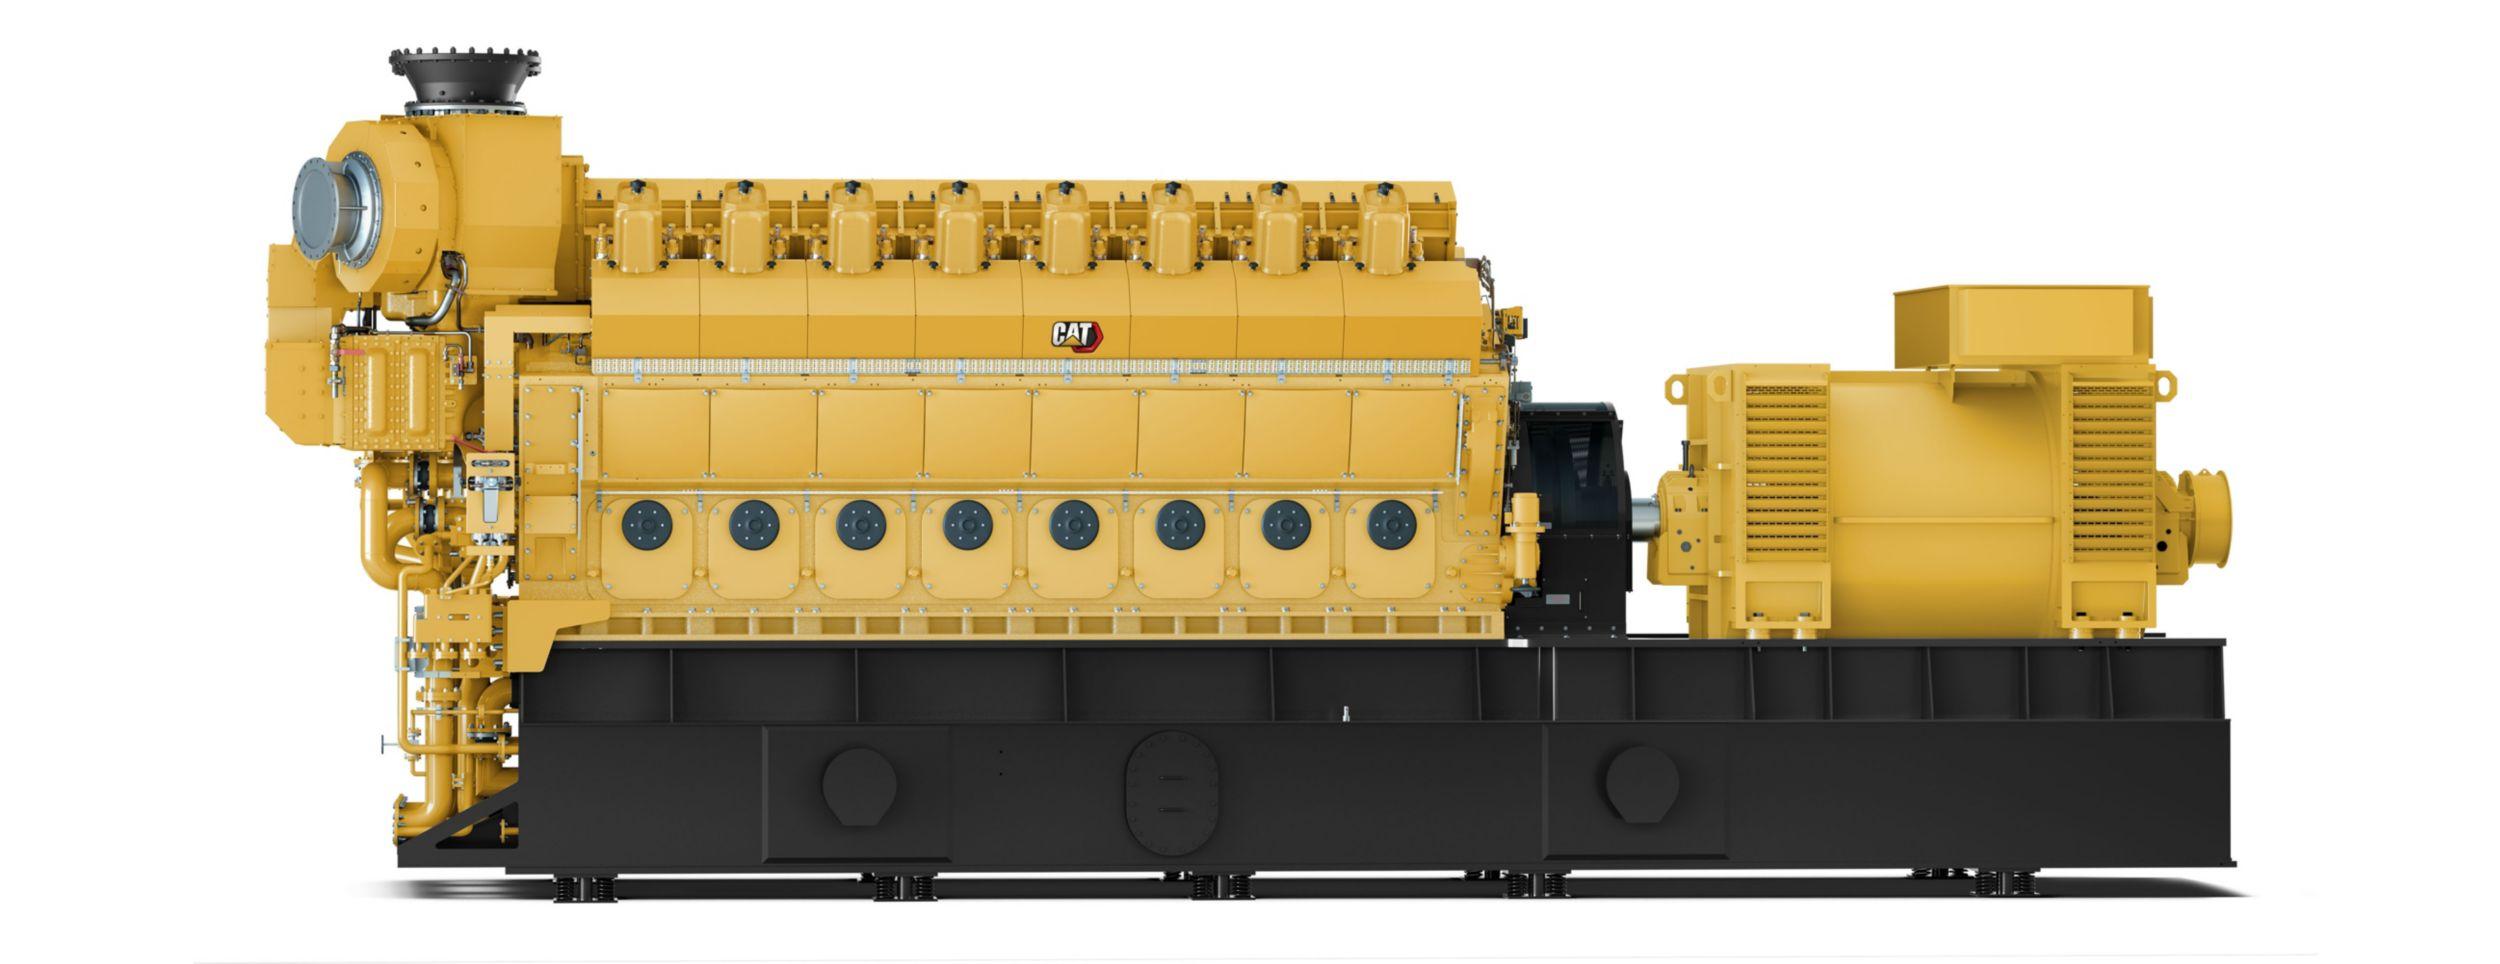 CM32E Electronic Power Generator Sets>